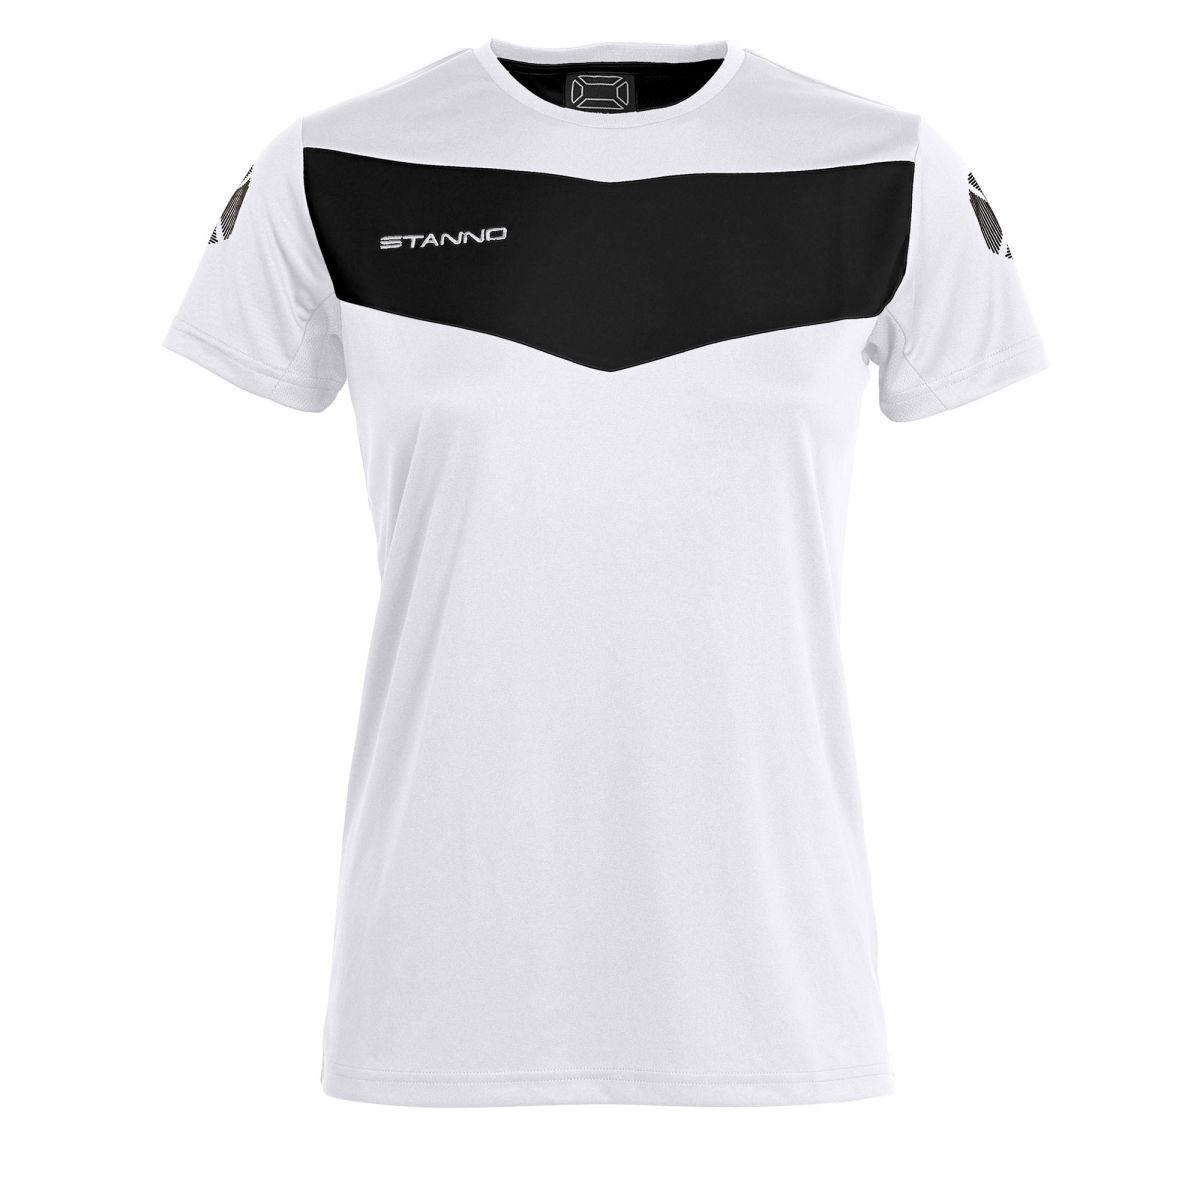 STANNO Fiero T-Shirts BNWT